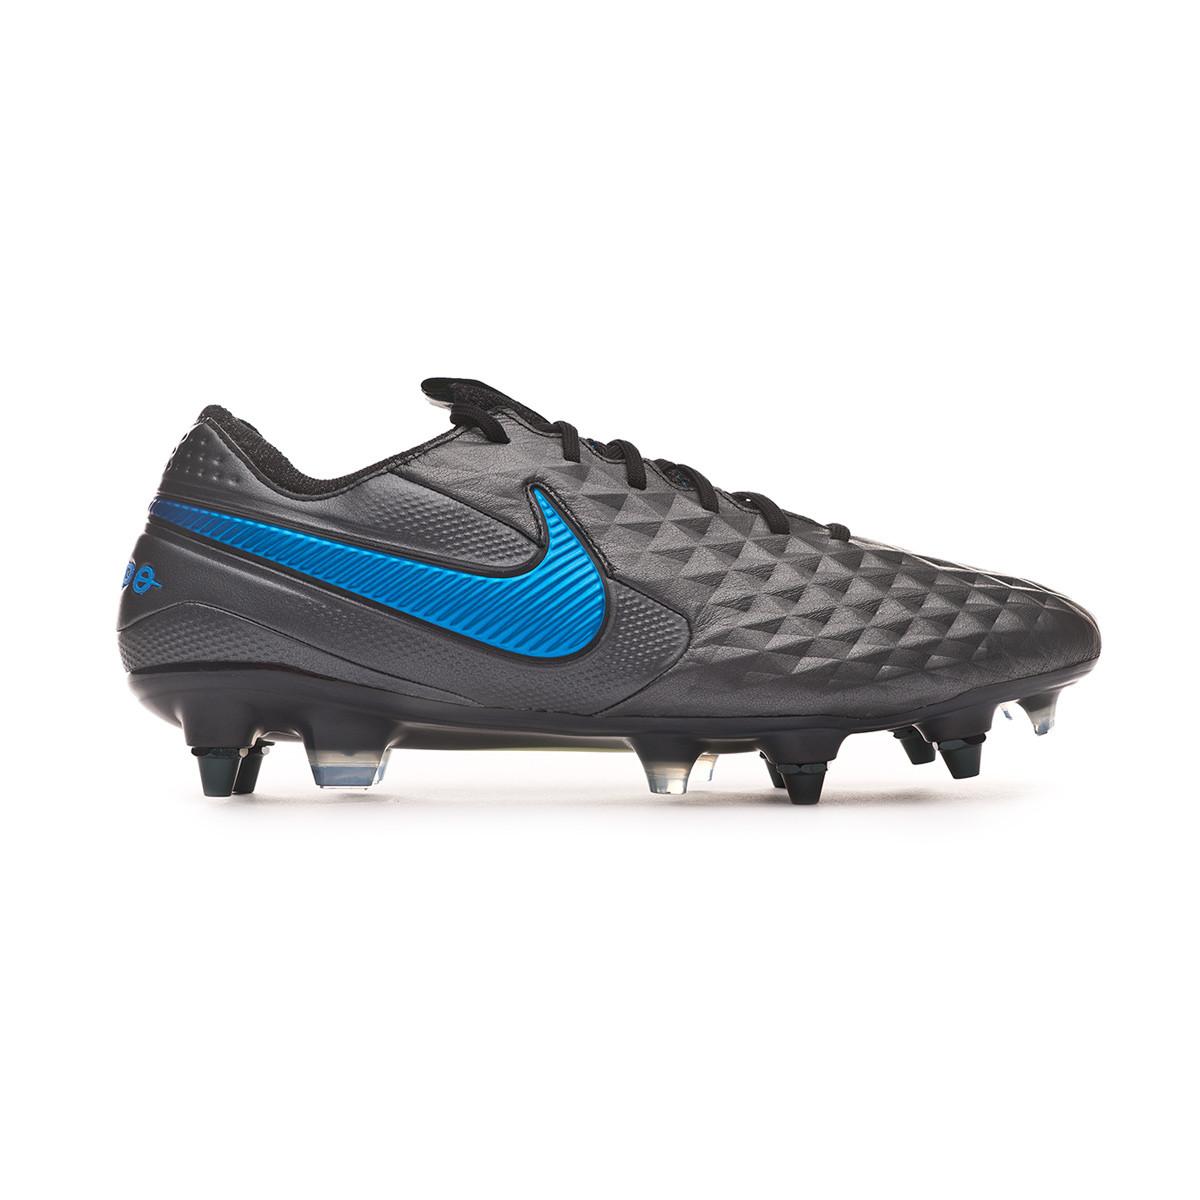 Estresante Alcalde africano  Football Boots Nike Tiempo Legend VIII Elite SG-PRO Anti-Clog Traction Black-Blue  hero - Football store Fútbol Emotion